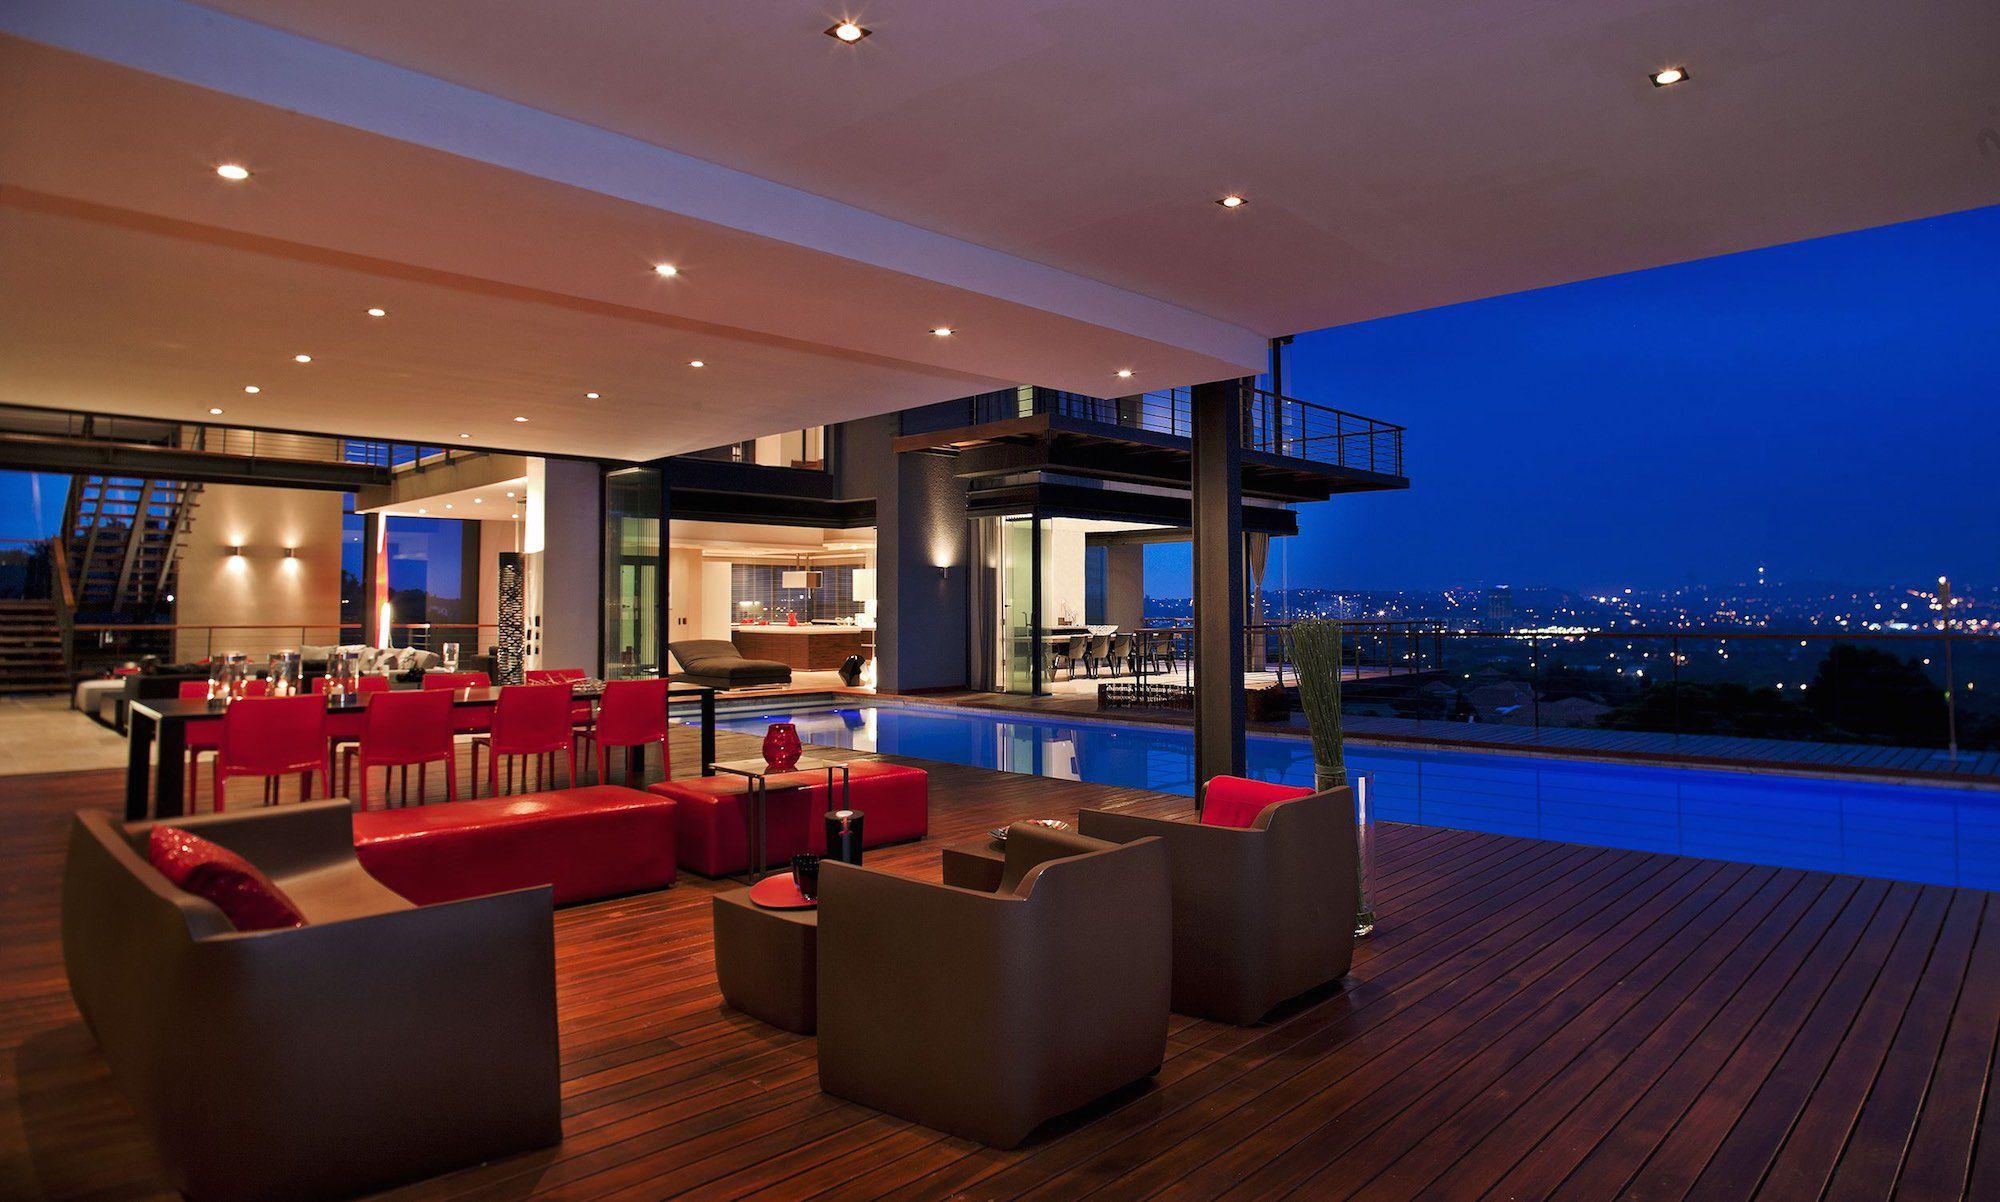 4Nico VD Meulen House Limbarda exterior nite Pan lookinginto house and pool 1